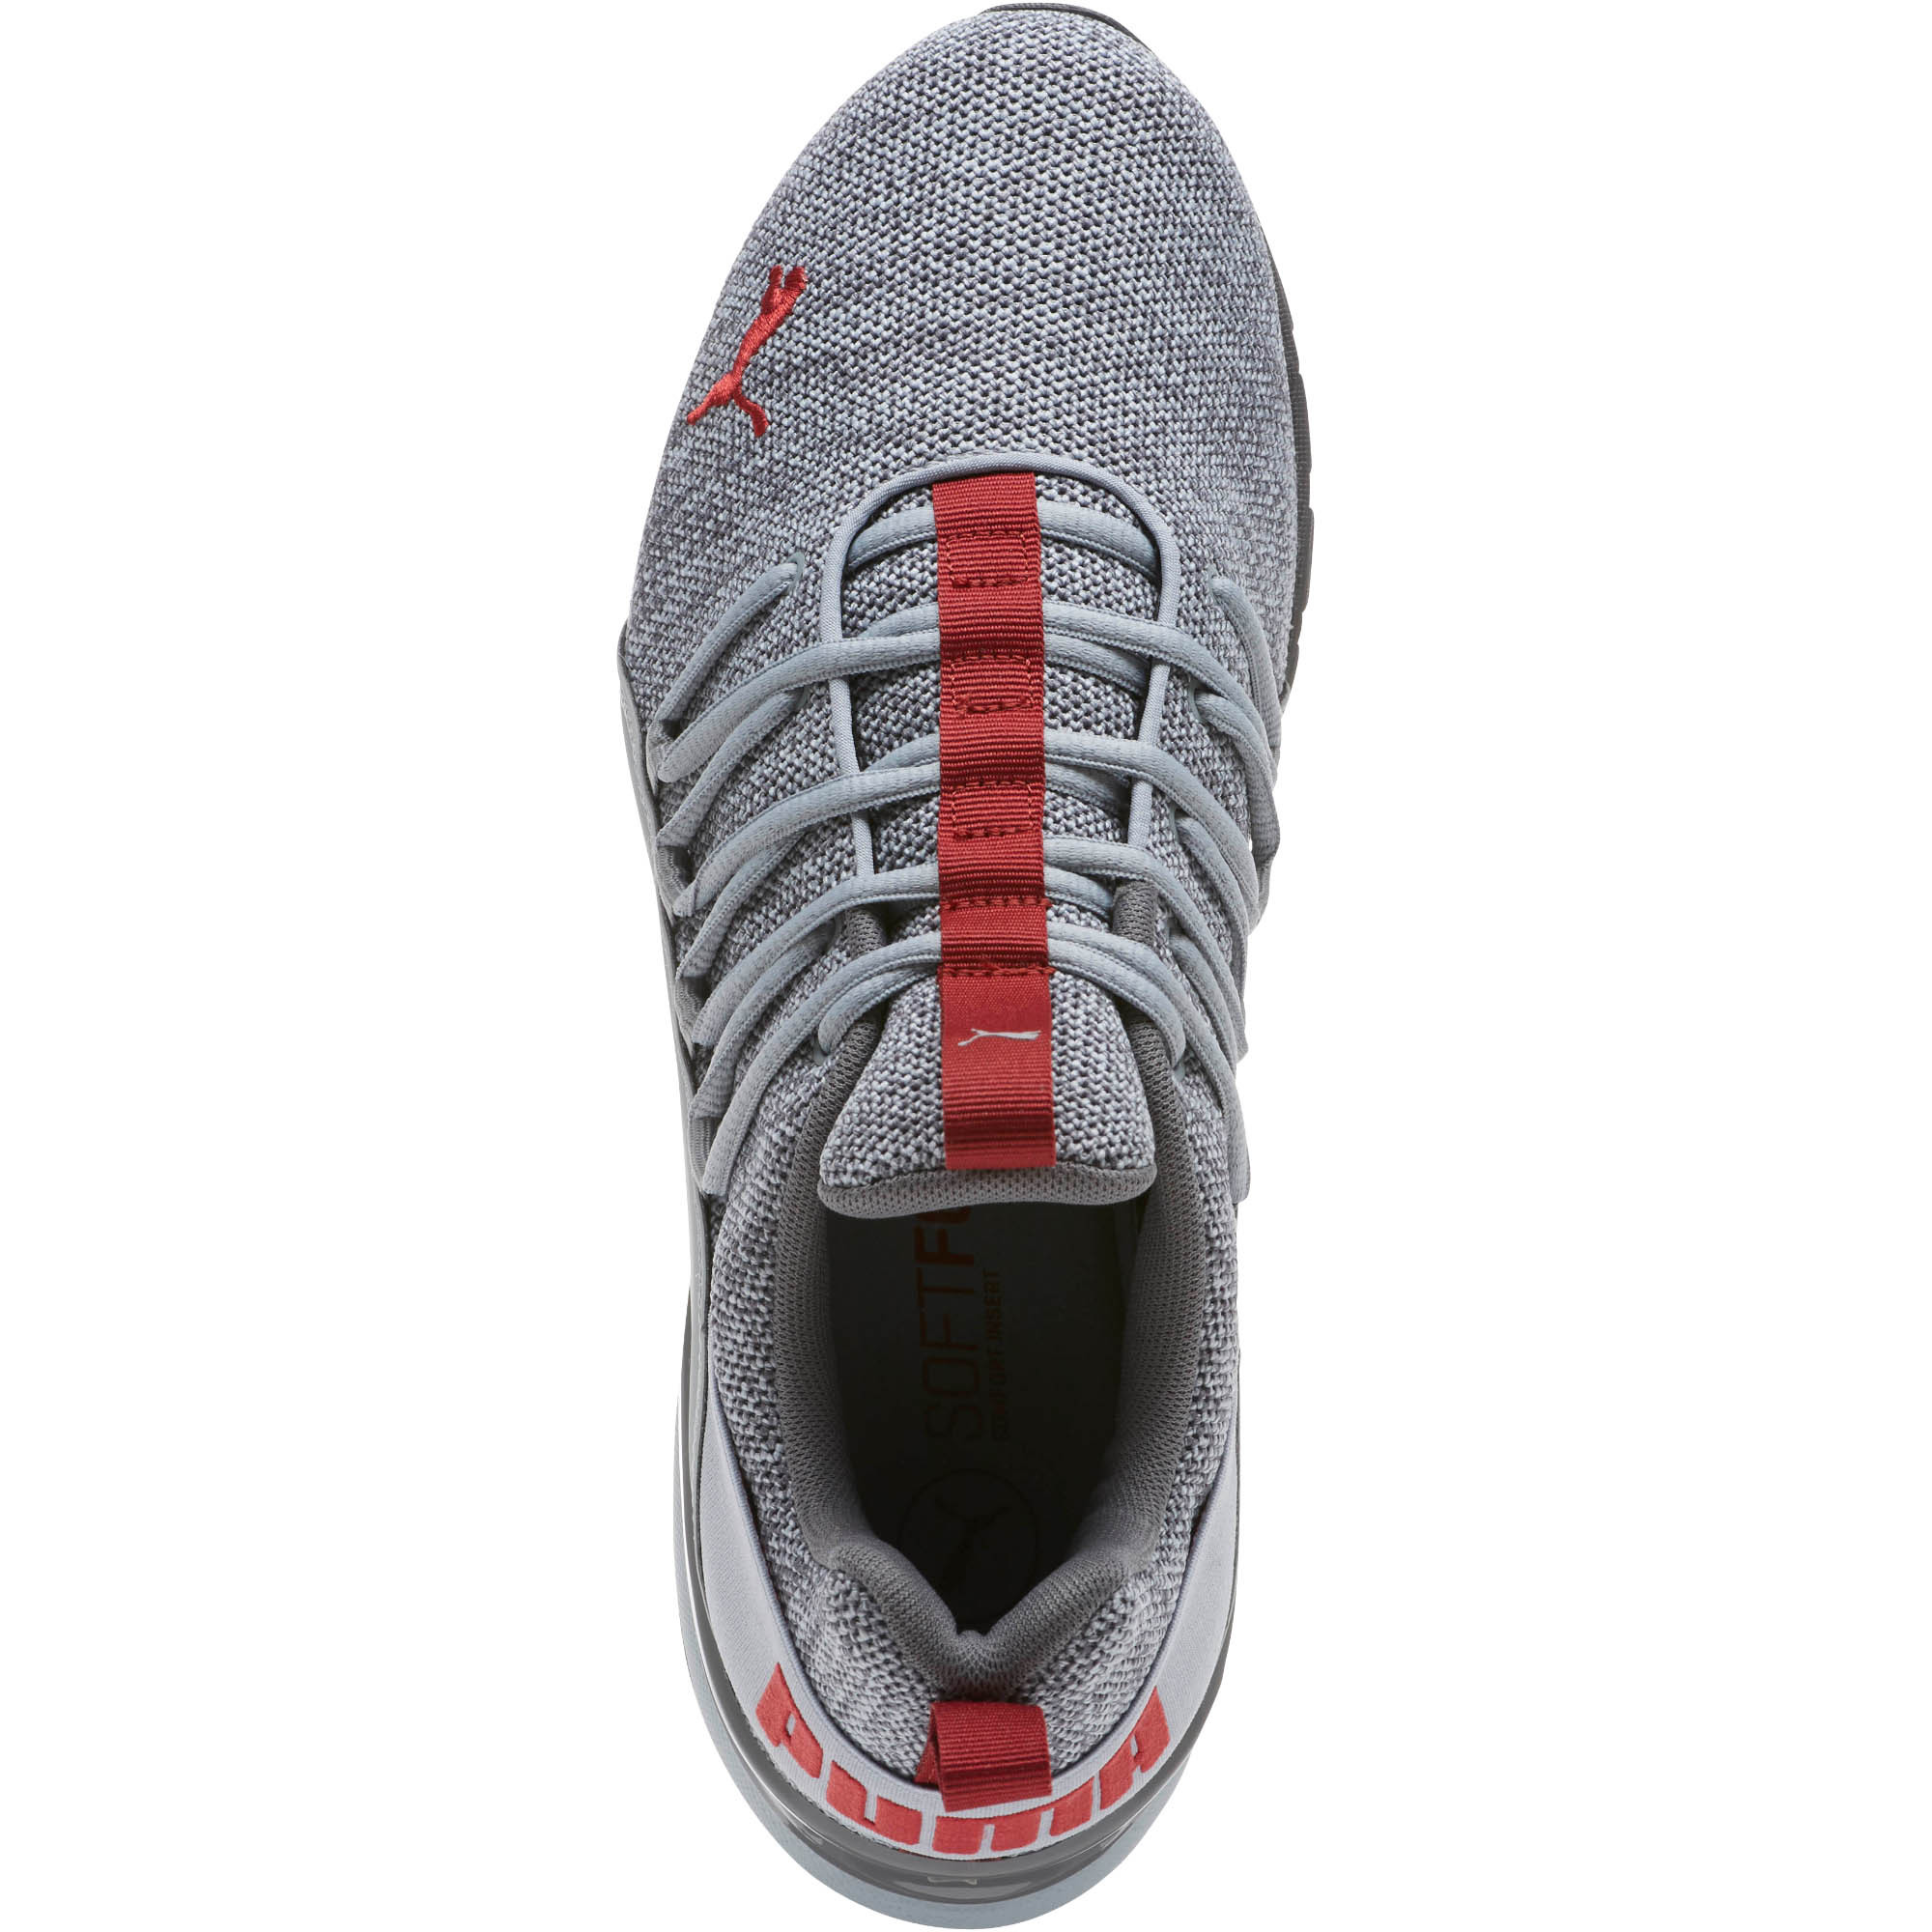 PUMA-Axelion-Men-039-s-Training-Shoes-Men-Shoe-Running thumbnail 3